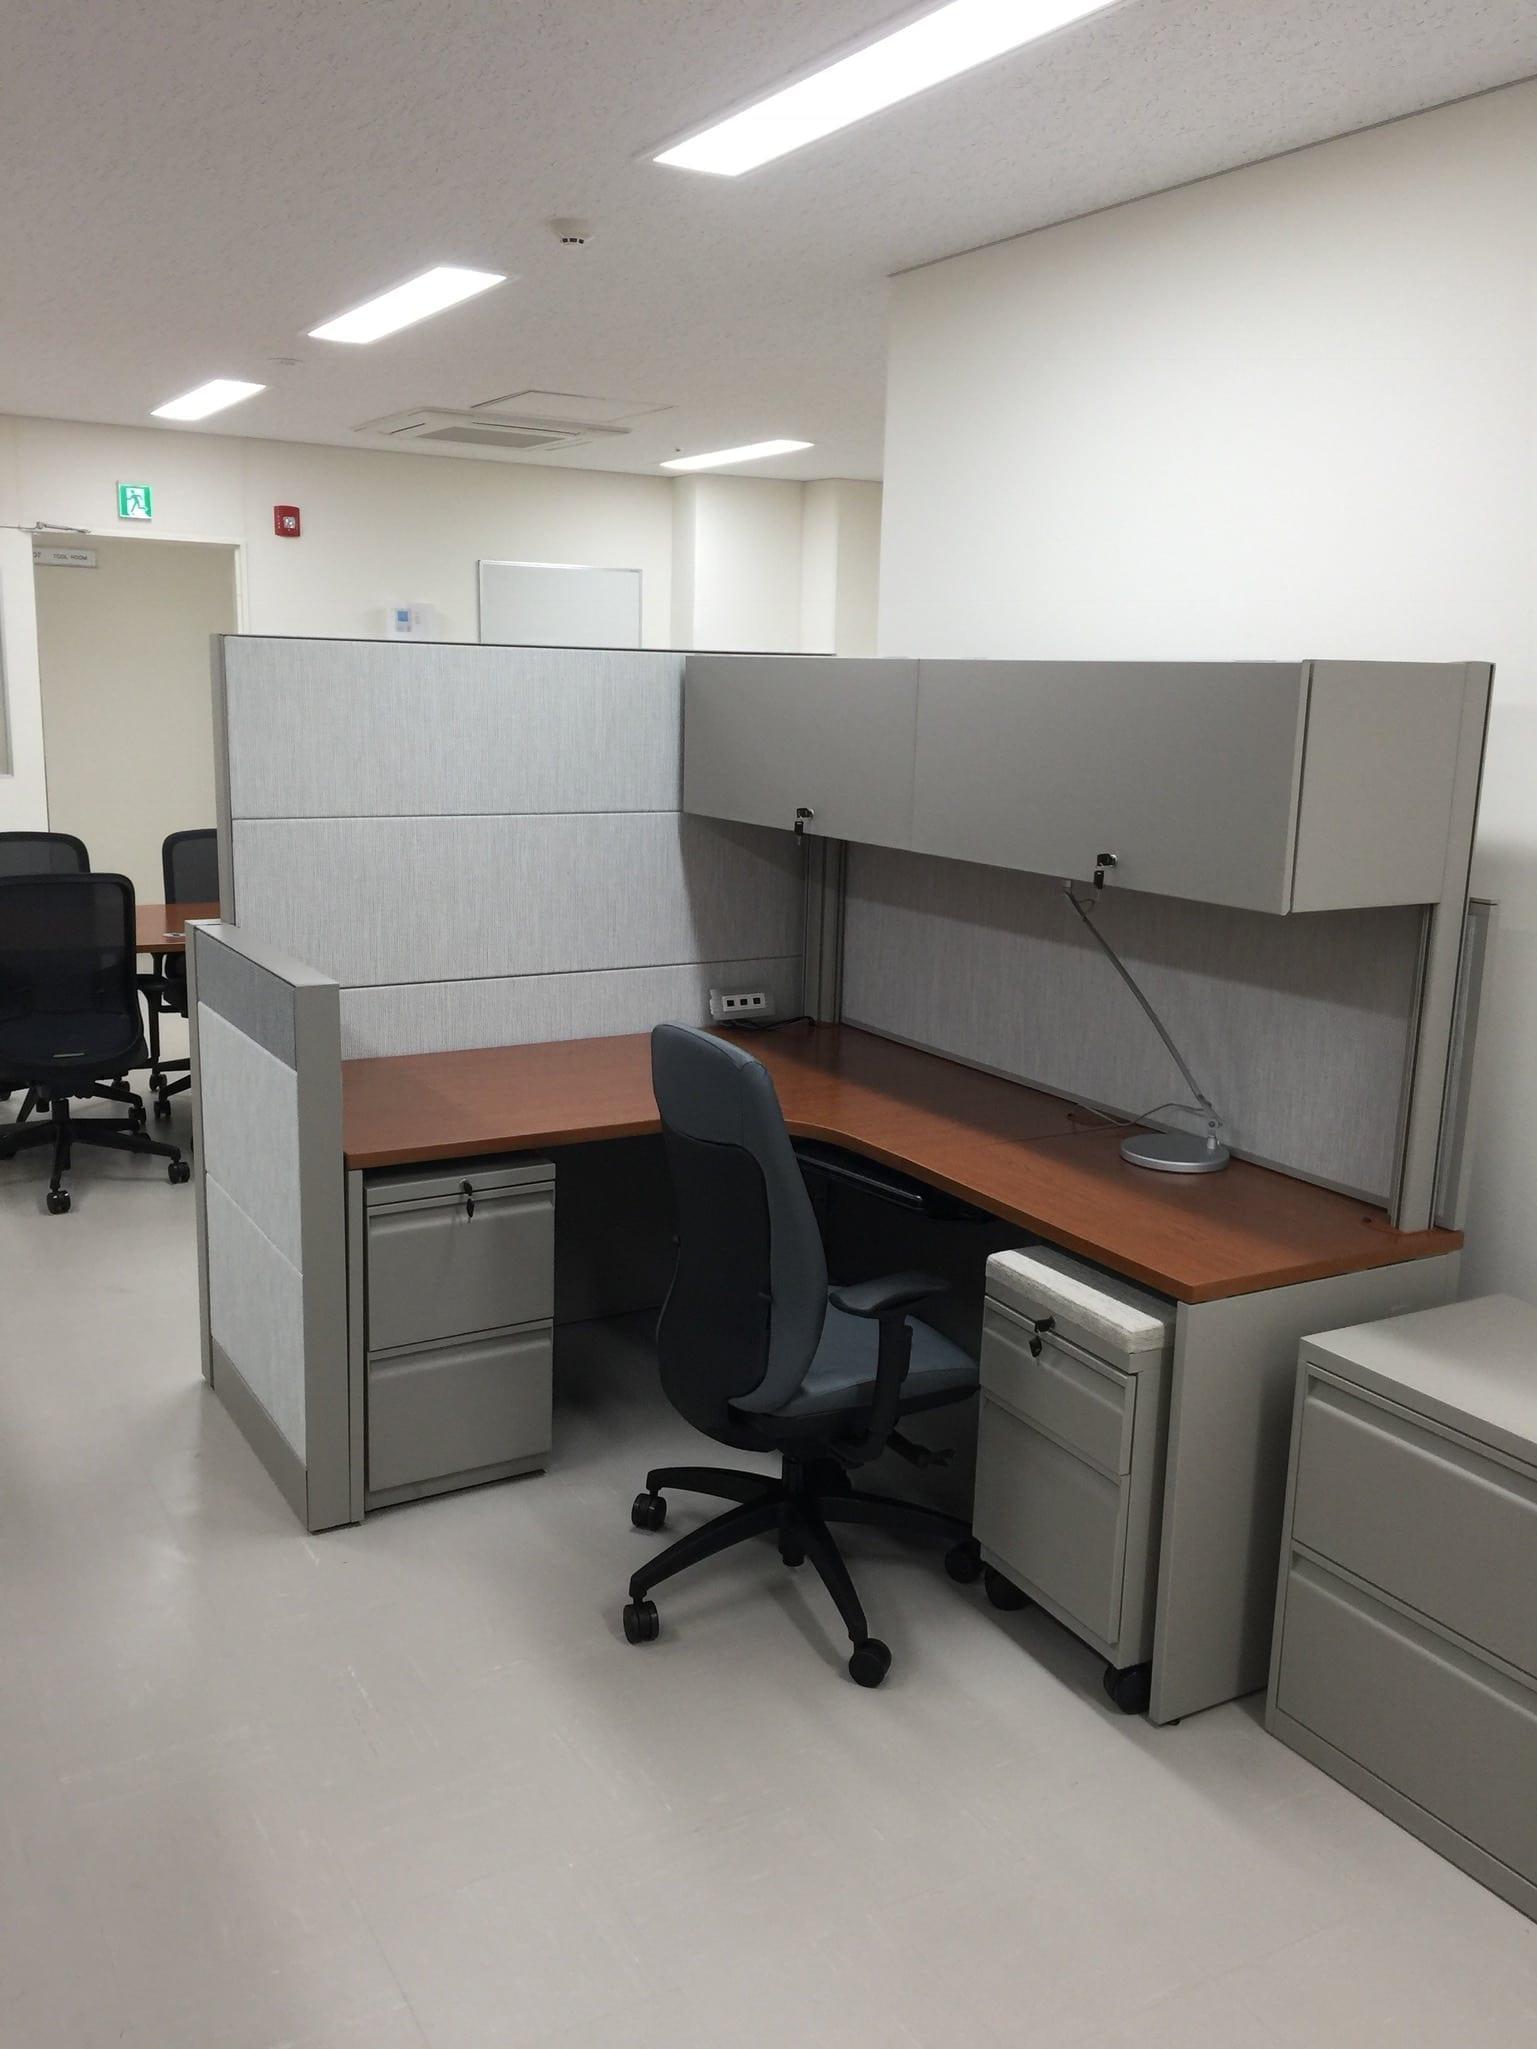 Office Furniture Installation At Akizuki Army Ammunition Depot In Camp Kure An